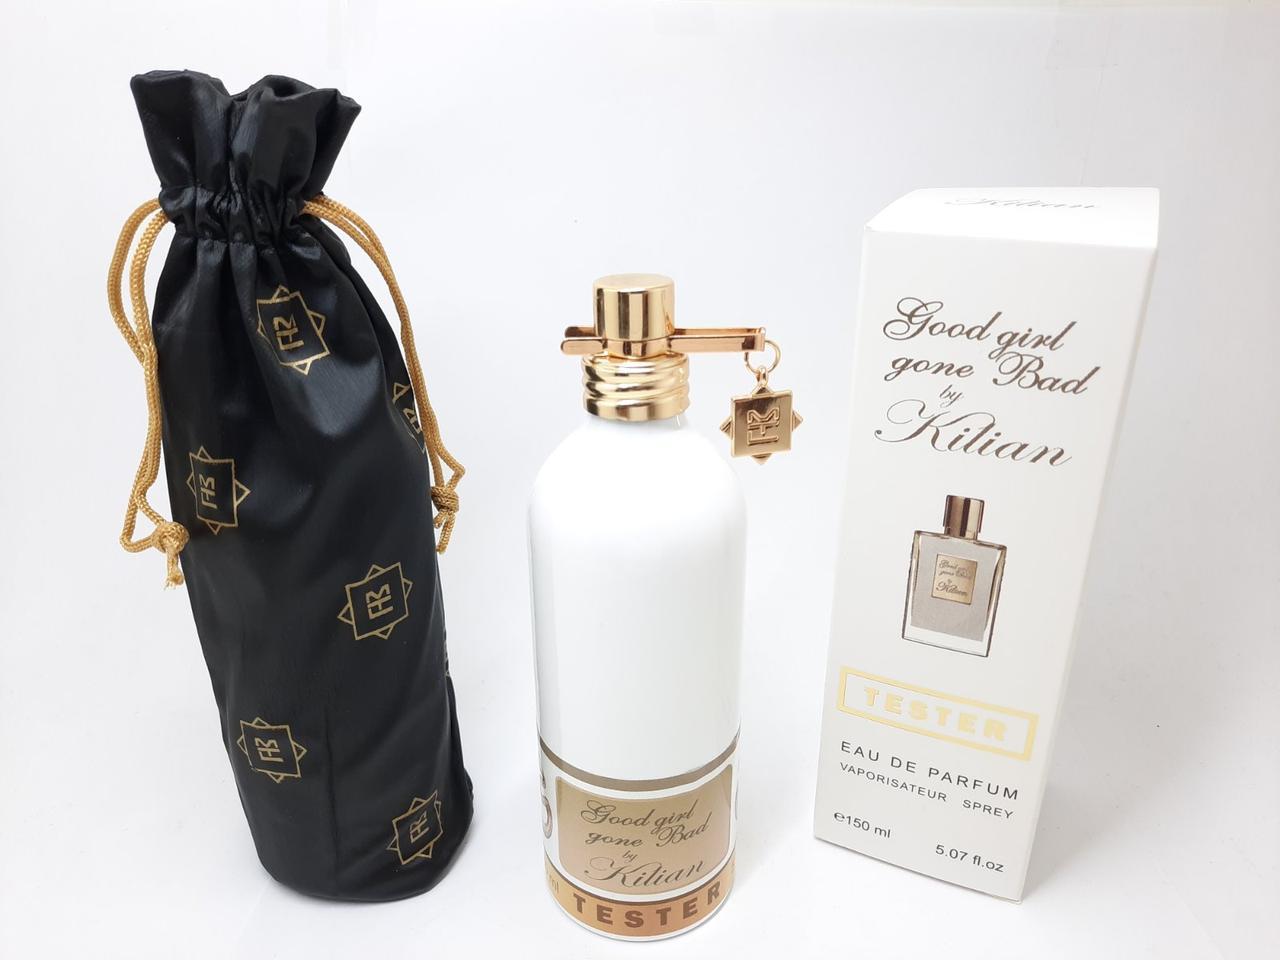 Тестер женской парфюмированой воды Kilian Good Girl Gone Bad MONTALE  (Килиан Гуд Герл Гон Бэд) 150 мл